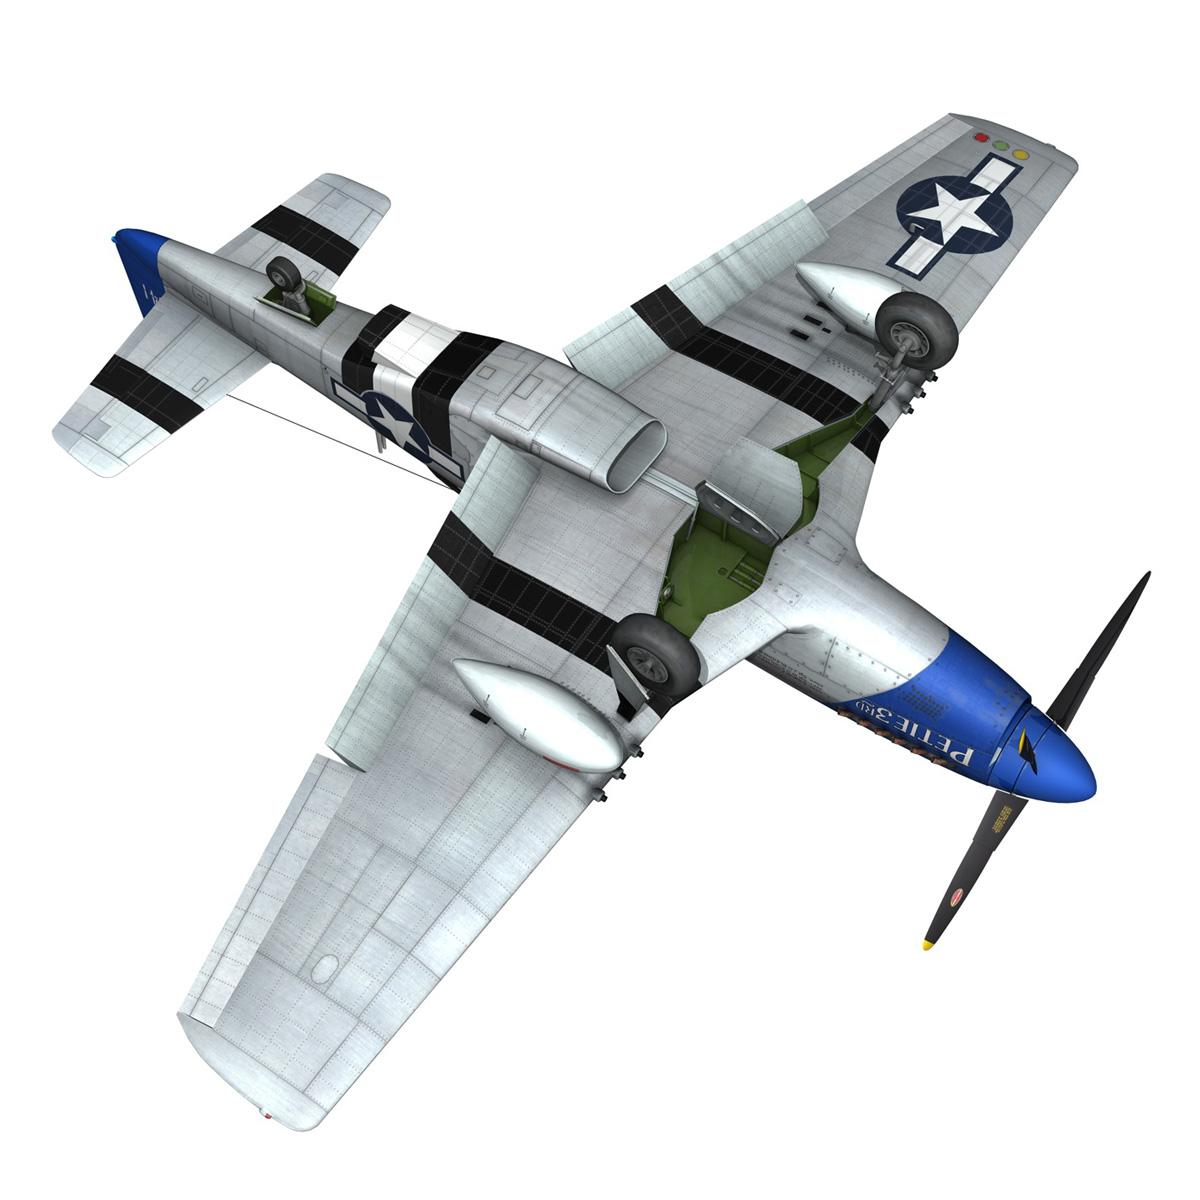 north american p-51d mustang – petie 3rd 3d model fbx c4d lwo obj 280142